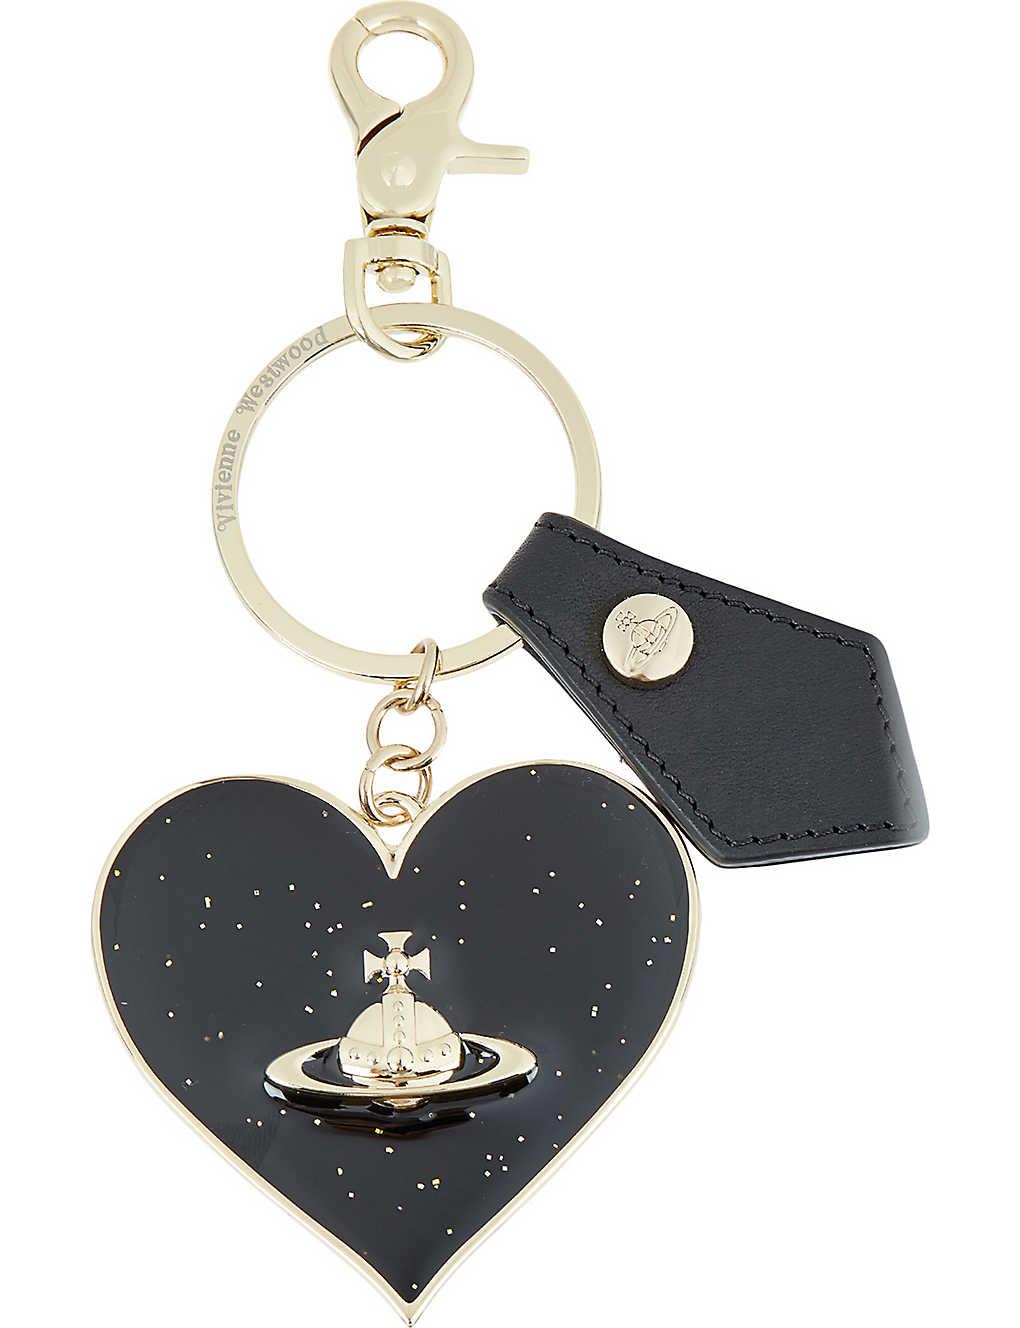 773c84cba5 VIVIENNE WESTWOOD - Gadget heart keyring   Selfridges.com